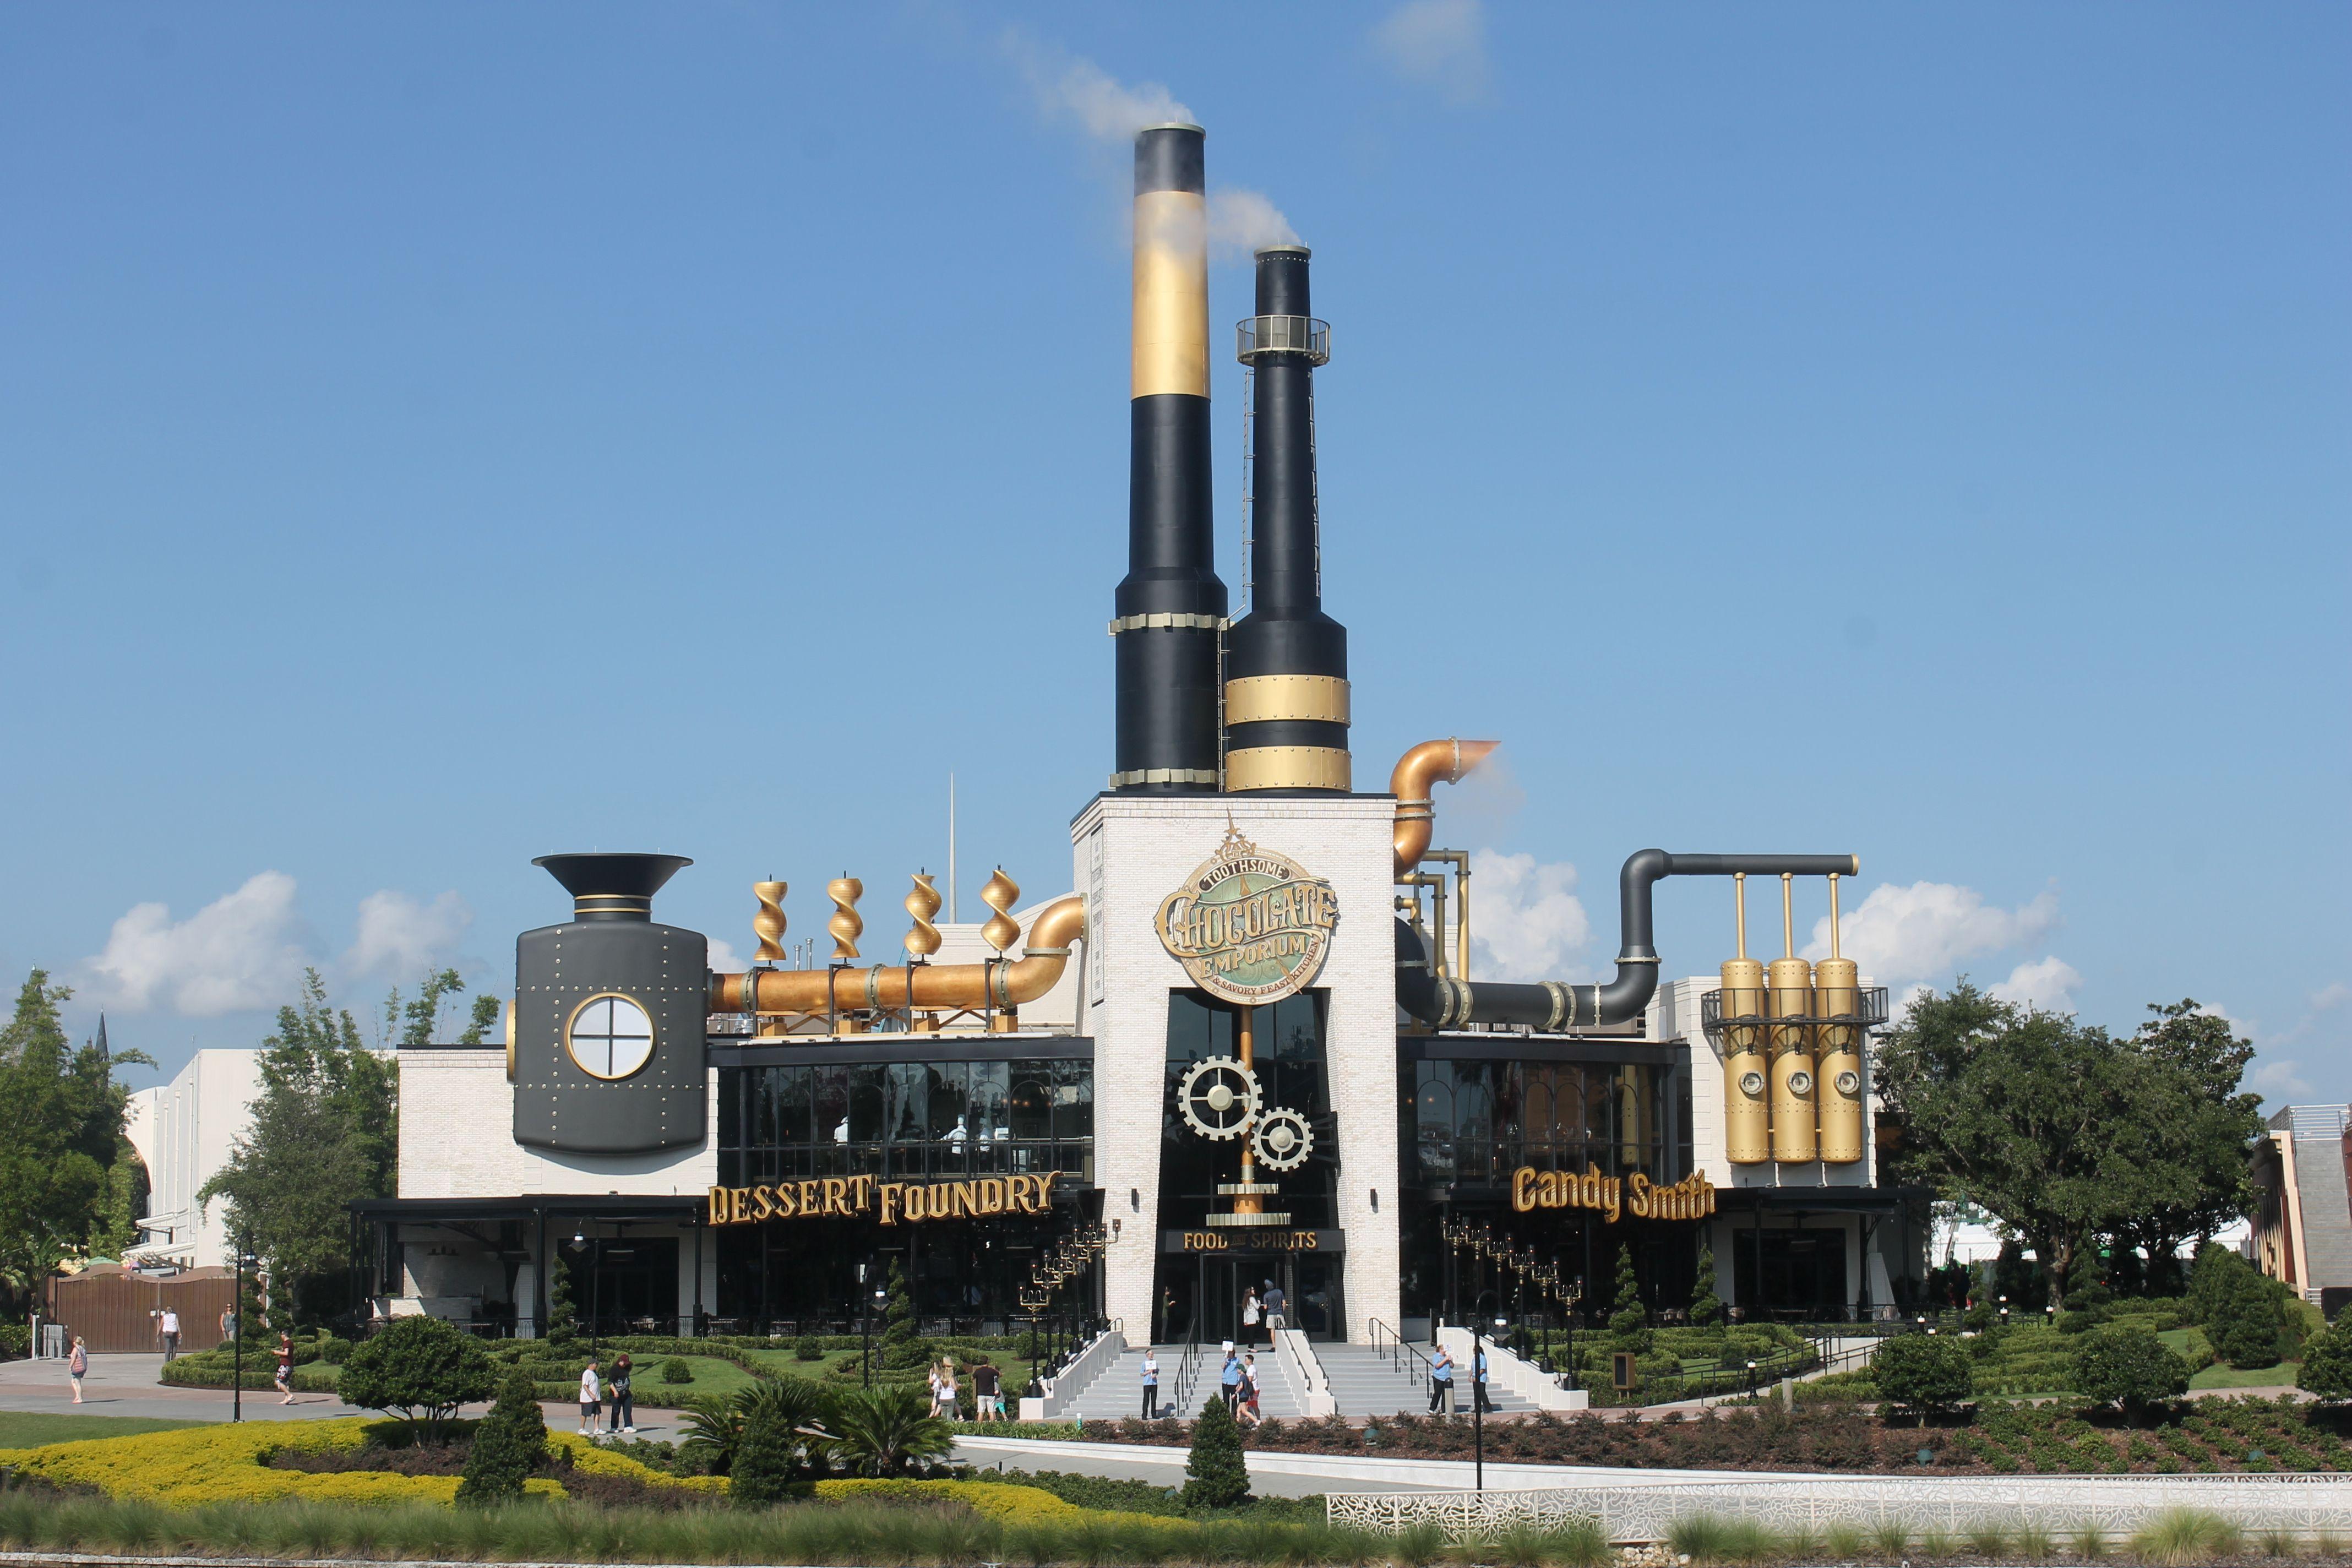 Toothsome Chocolate Emporium Universal CityWalk Orlando